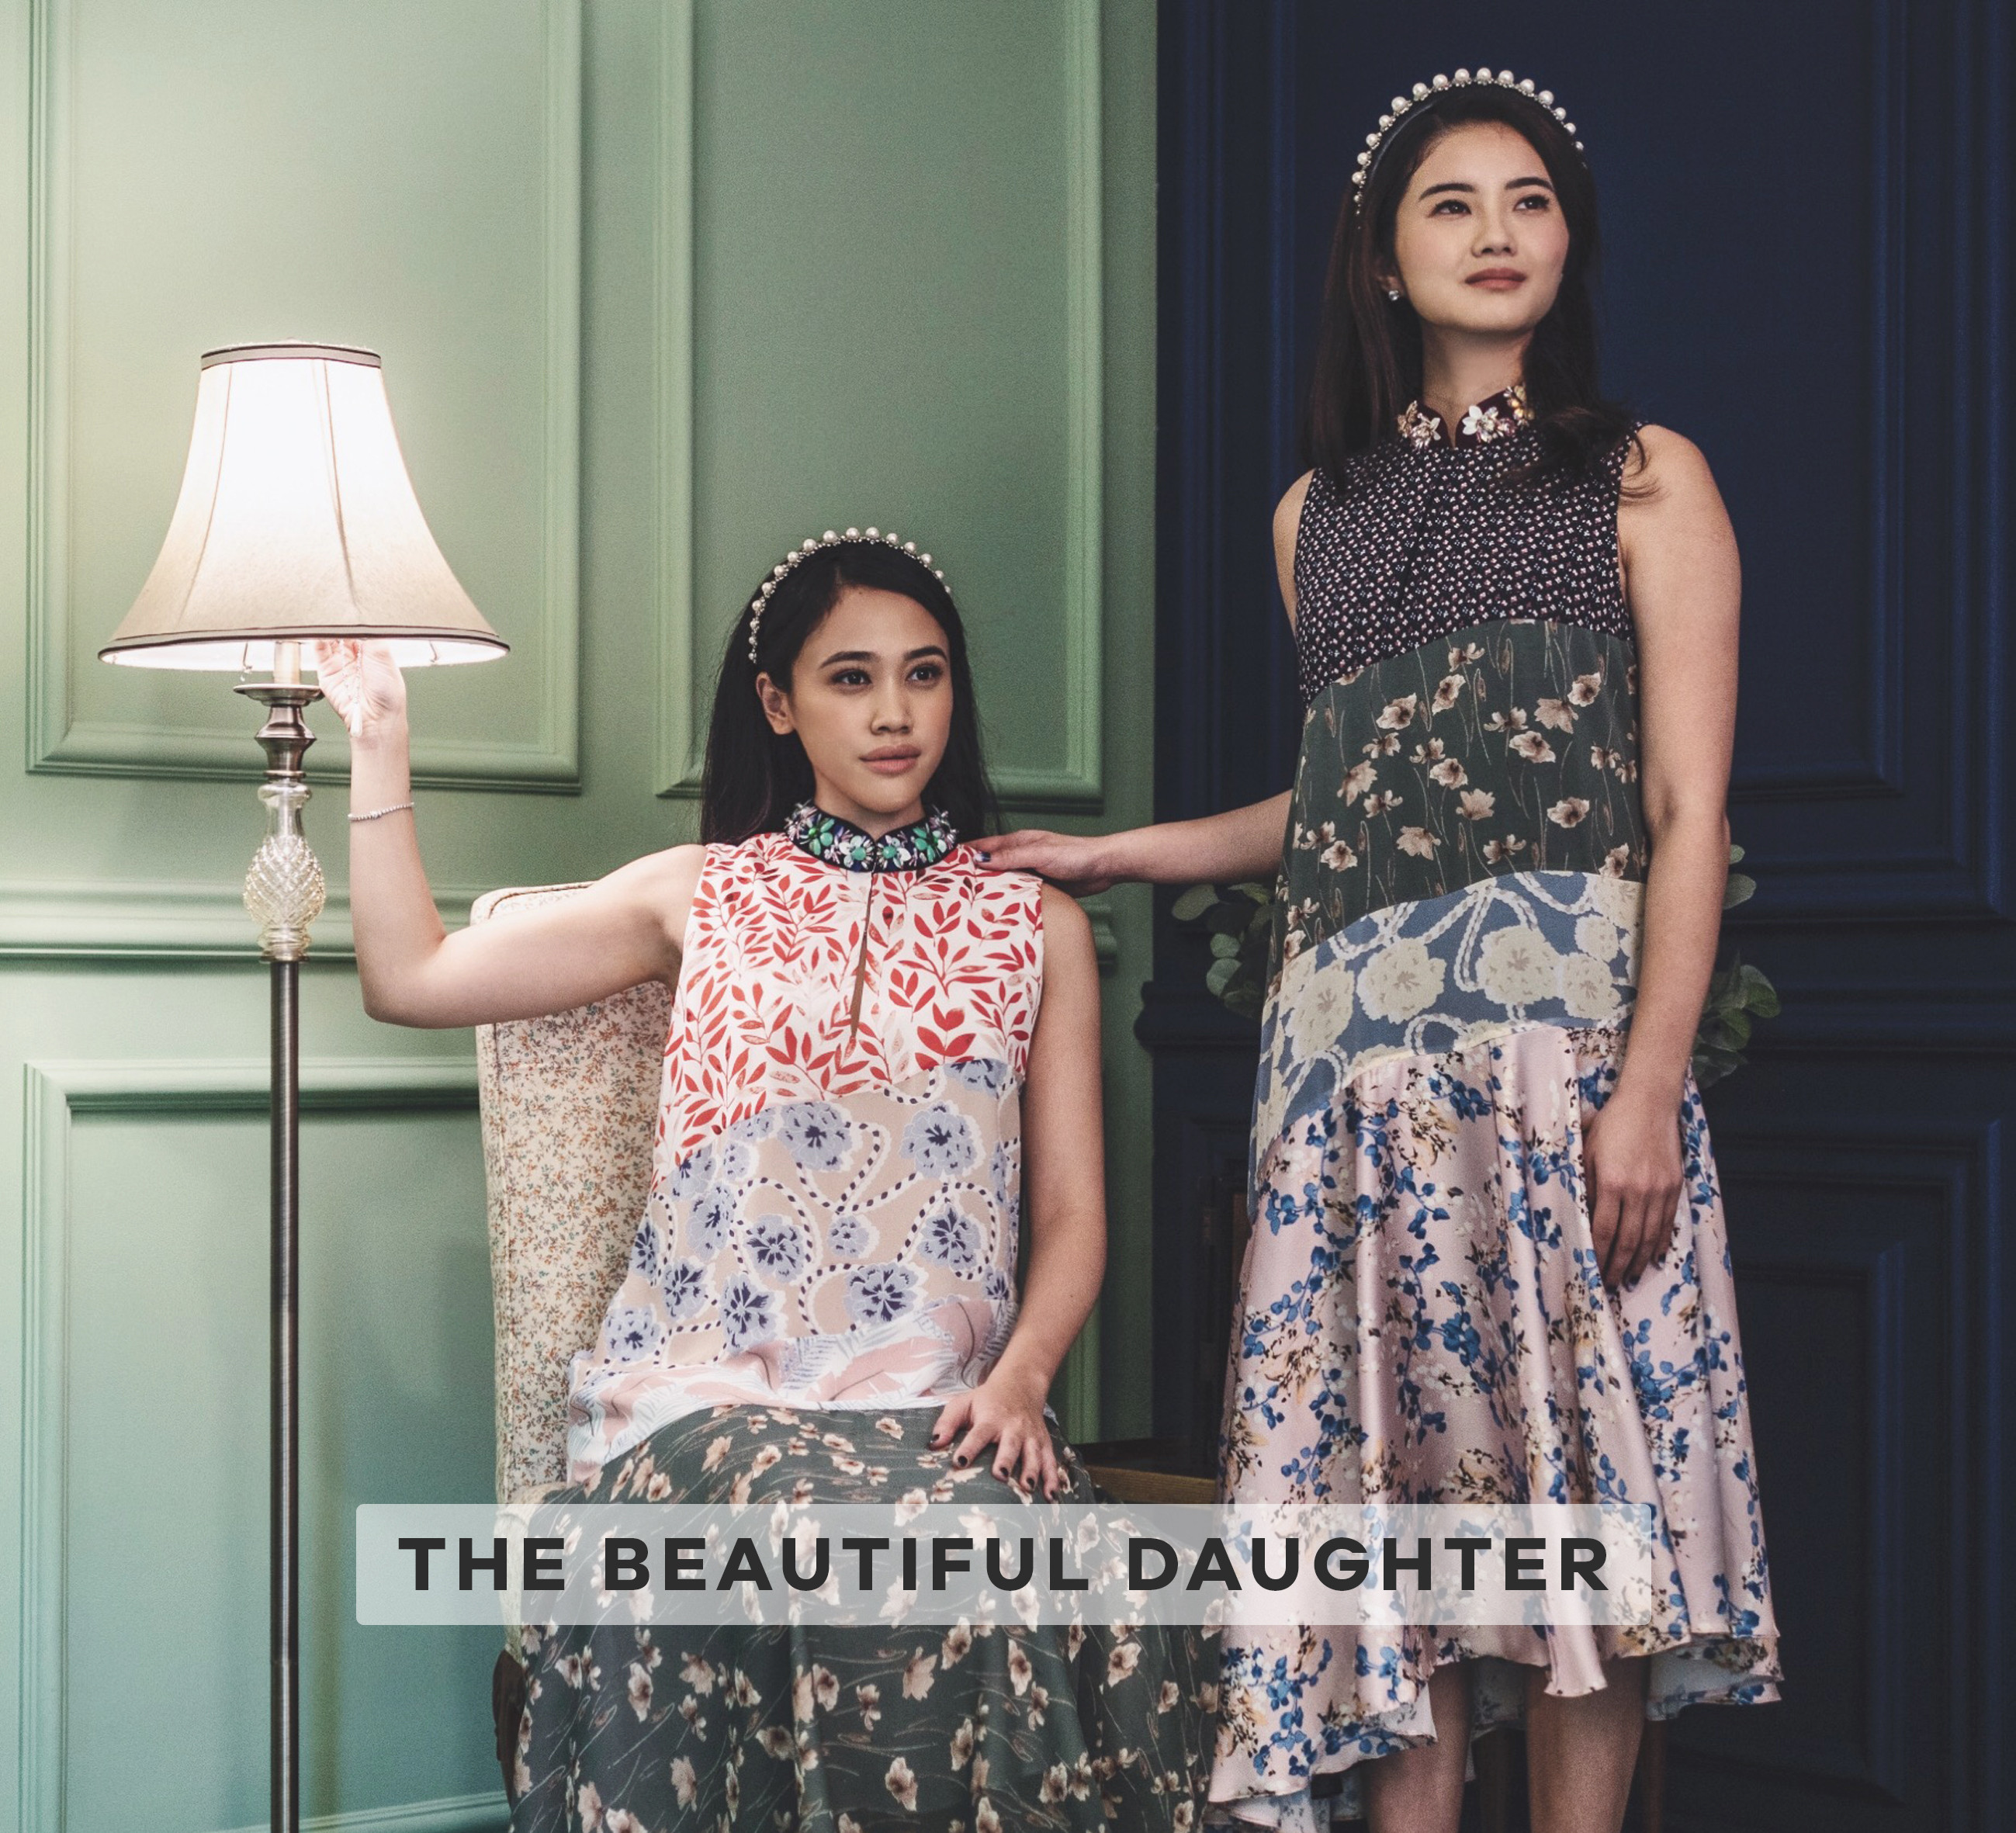 THE BEAUTIFUL DAUGHTER